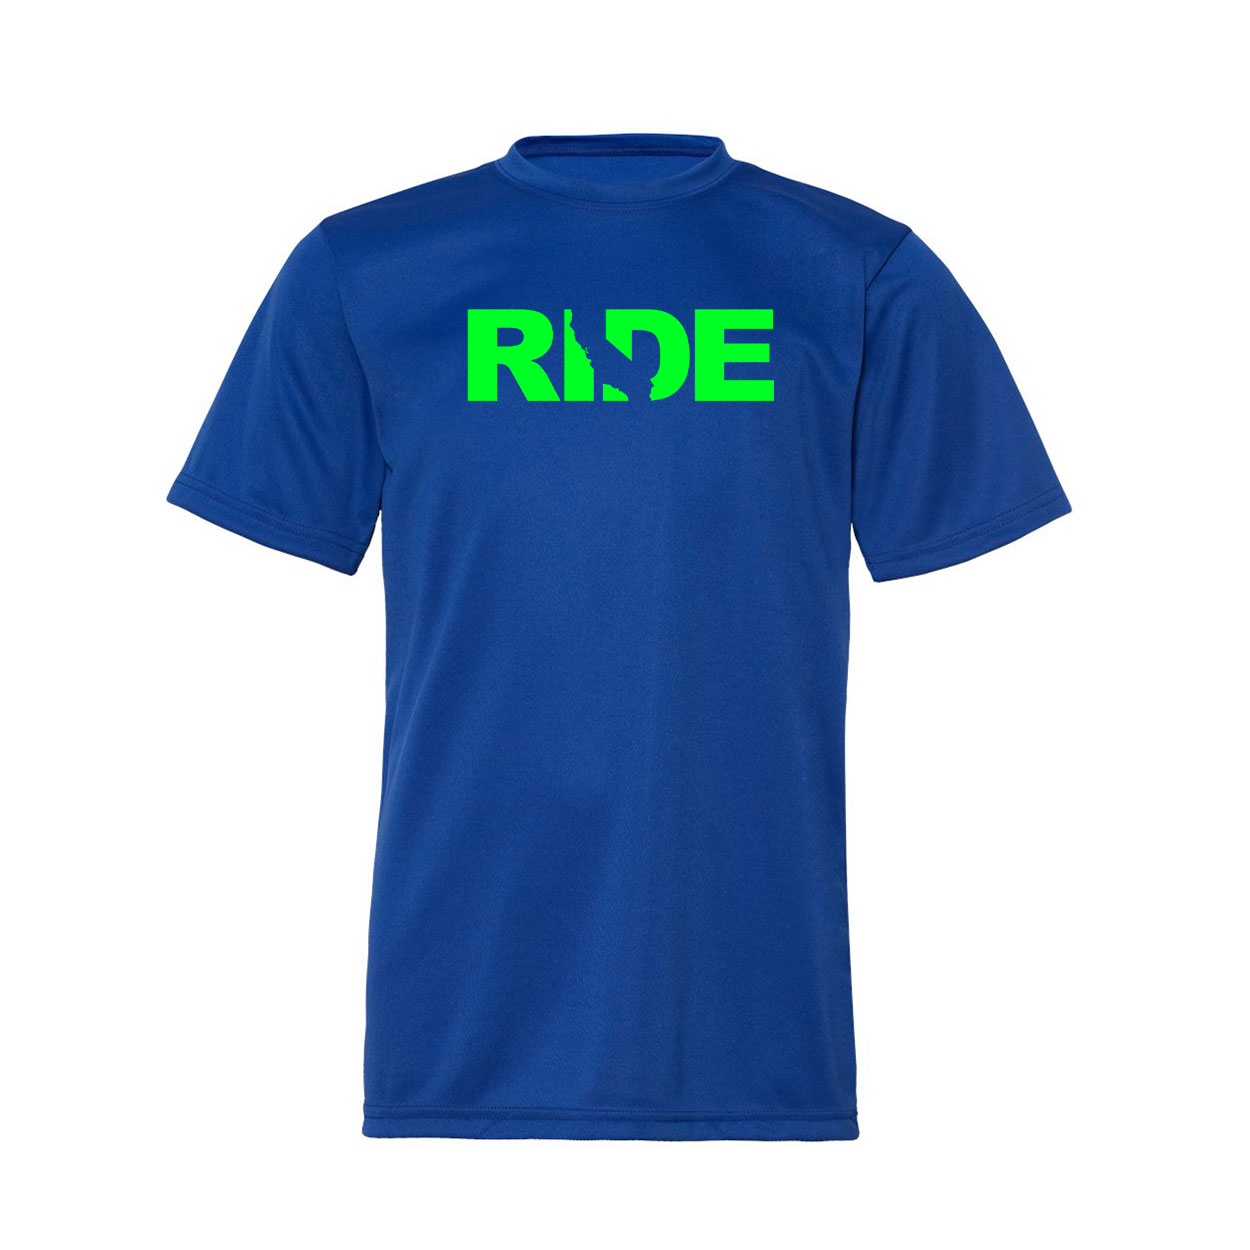 Ride California Classic Youth Unisex Performance T-Shirt Royal Blue (Green Logo)